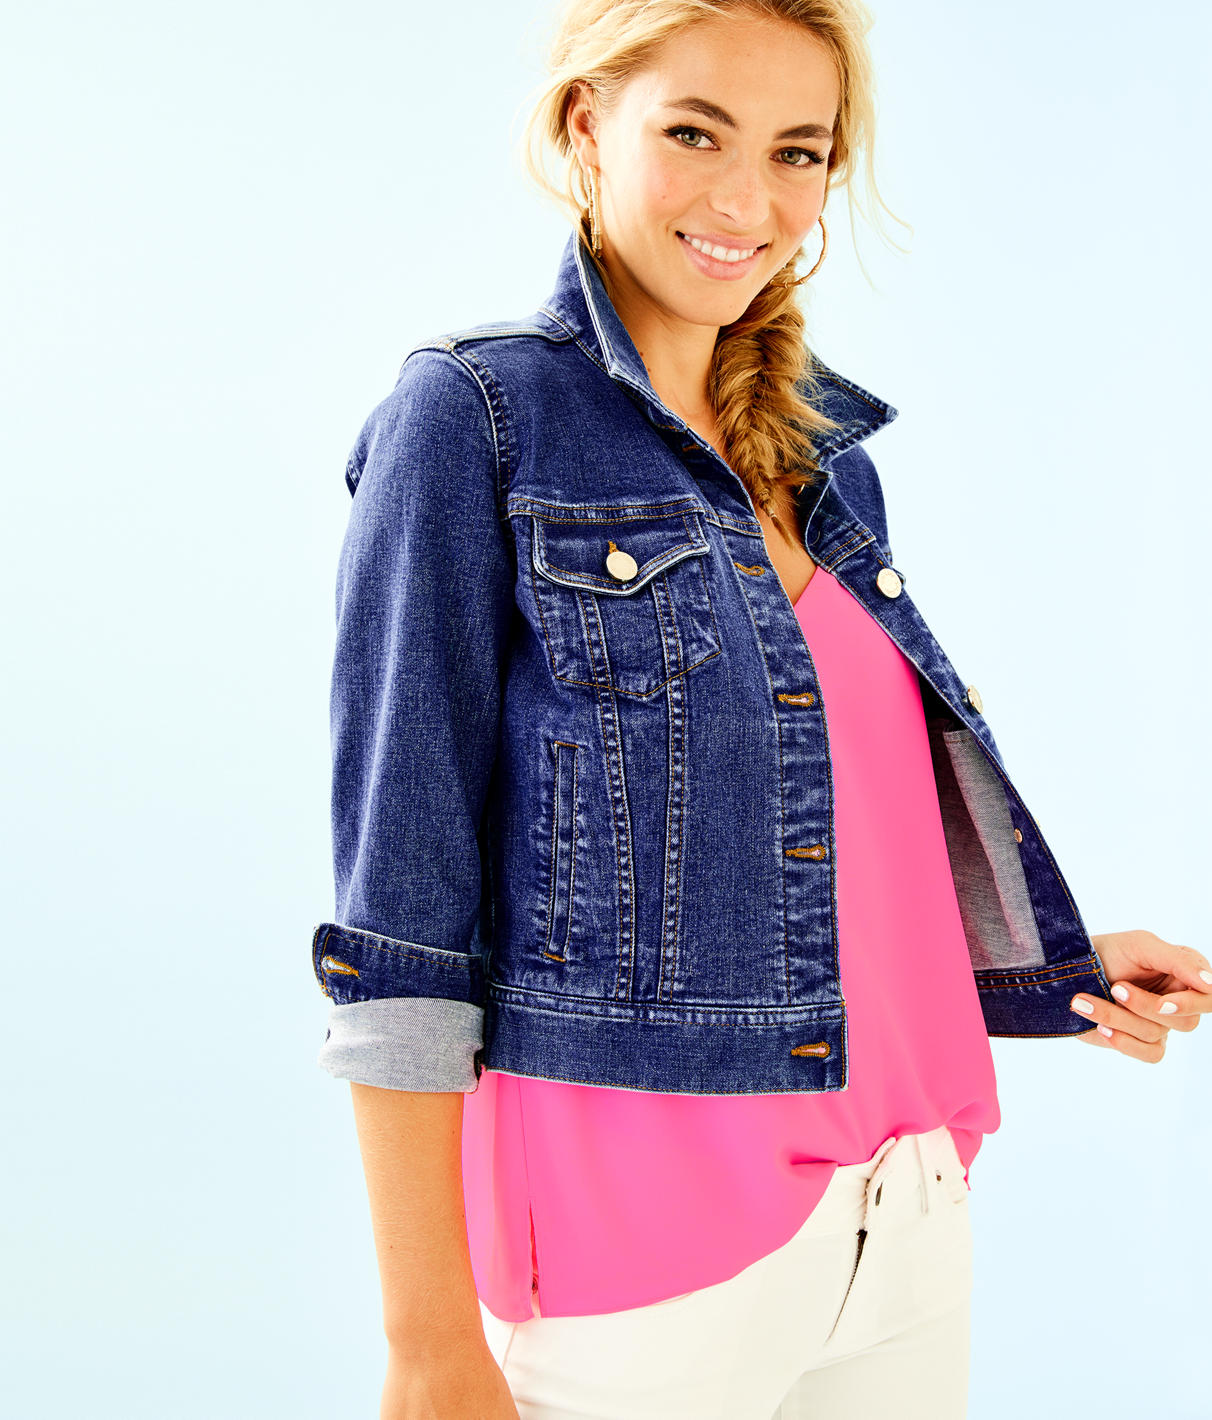 Lilly Pulitzer Seaspray Denim Jacket